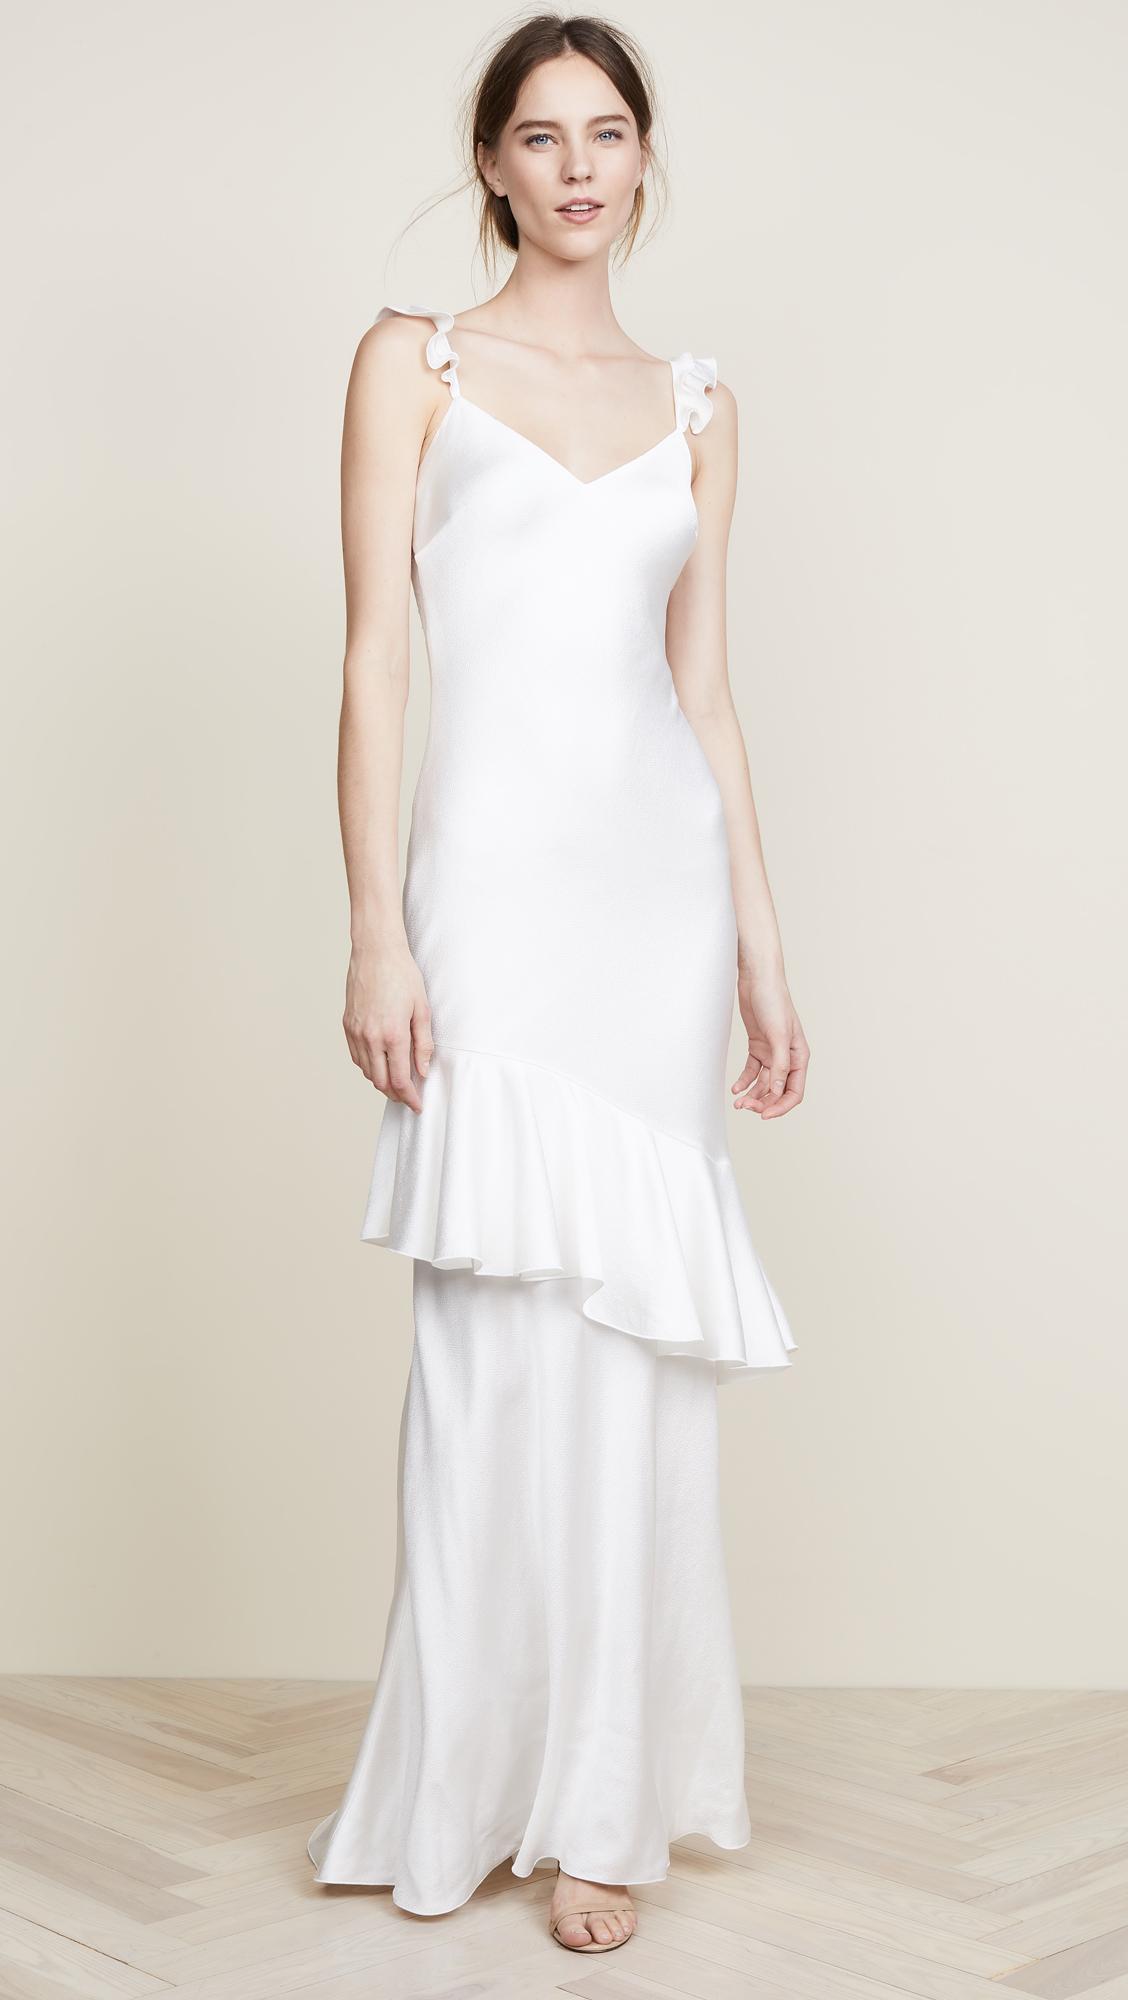 NICOLINA DRESS BY RACHEL ZOE, ON SALE FOR $437.50 AT SHOPBOP.COM